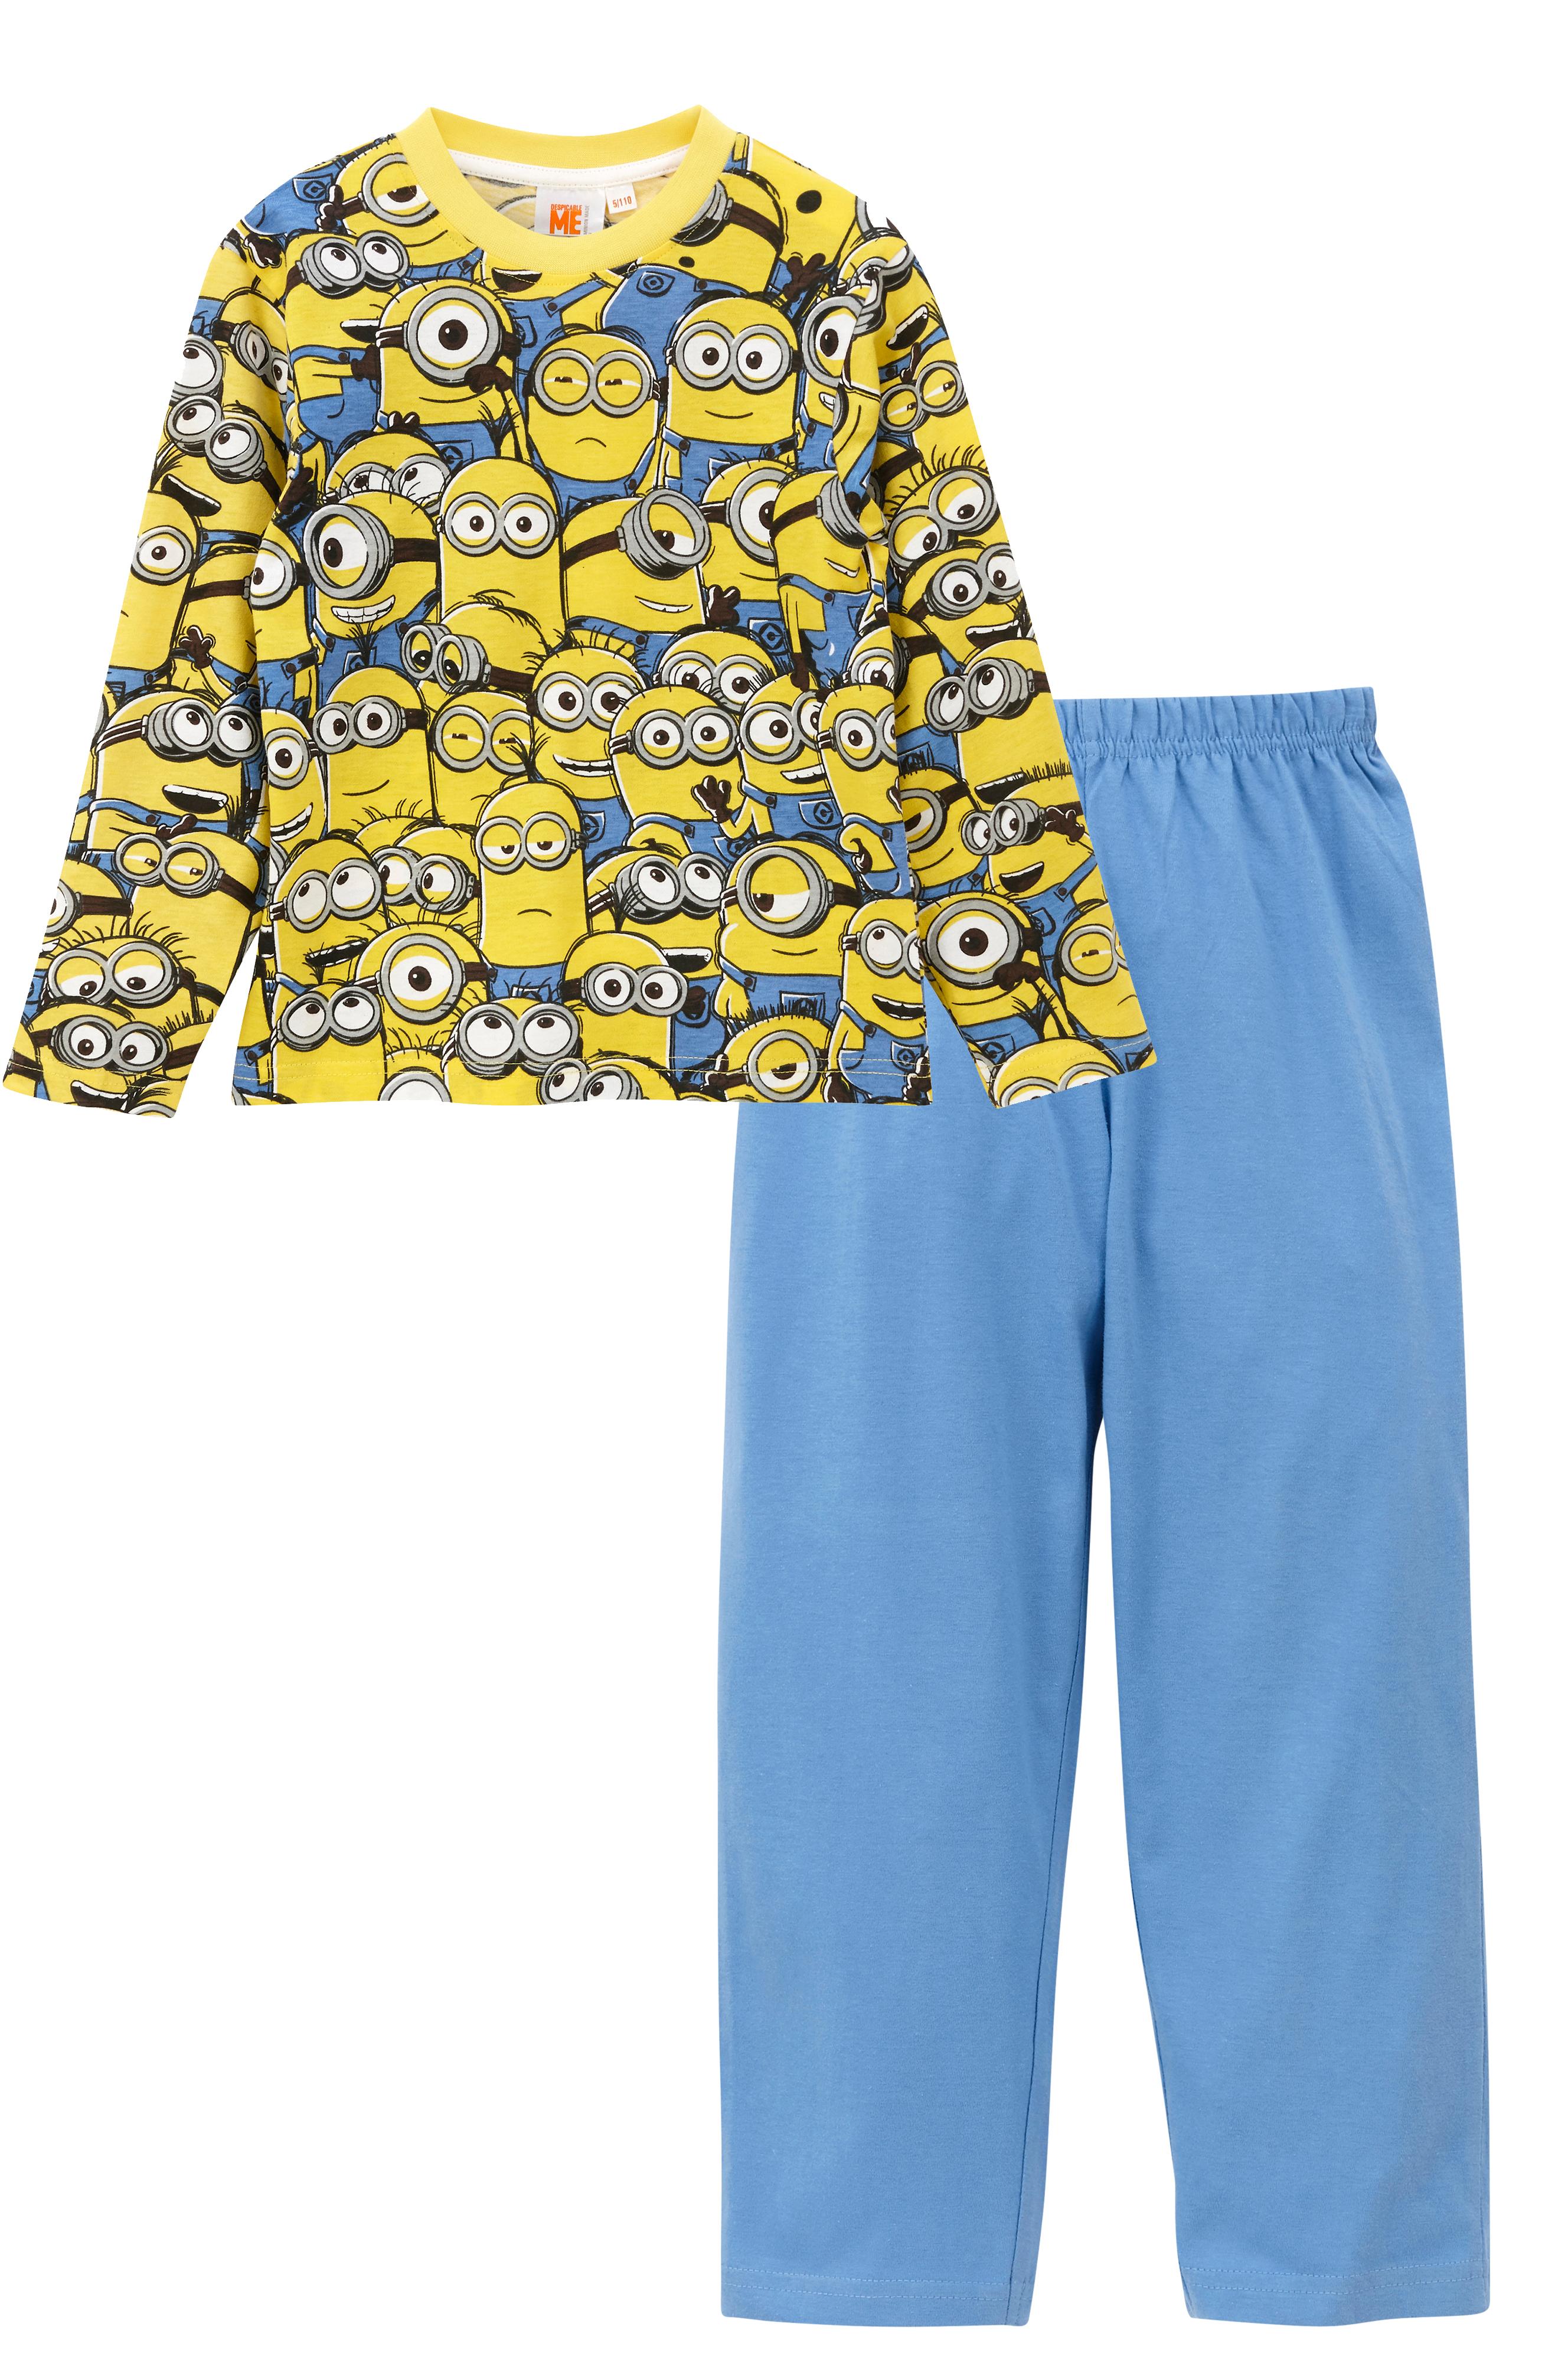 Minions Pyjamas Minion - Blå - Barn - Ellos.no d9fafac08881a